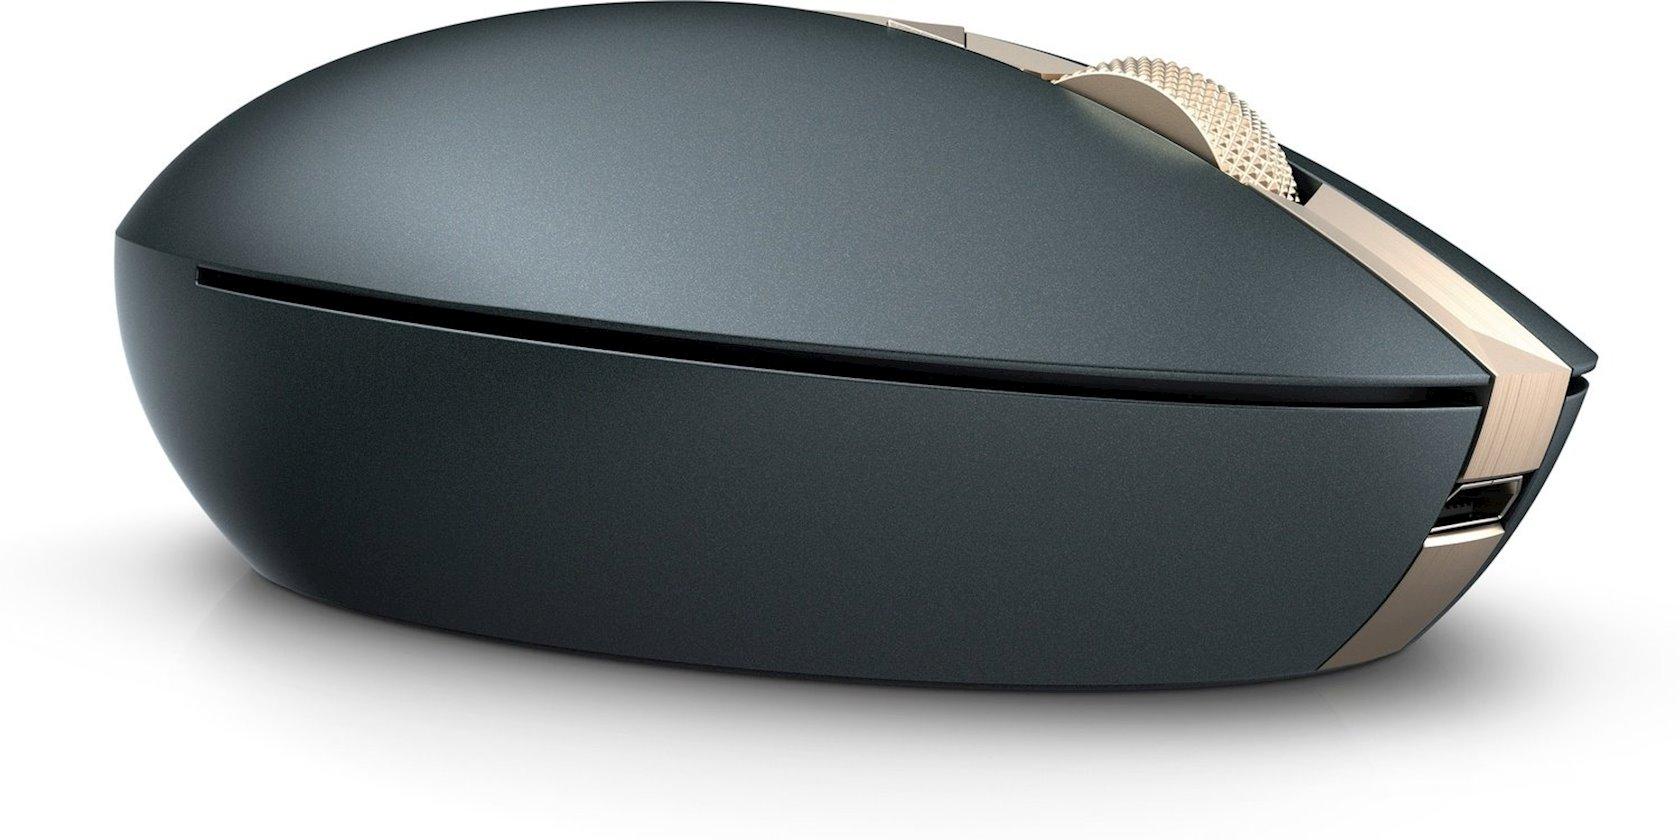 Simsiz siçan HP Spectre Wireless Mouse 700 4yh34aa Bluetooth